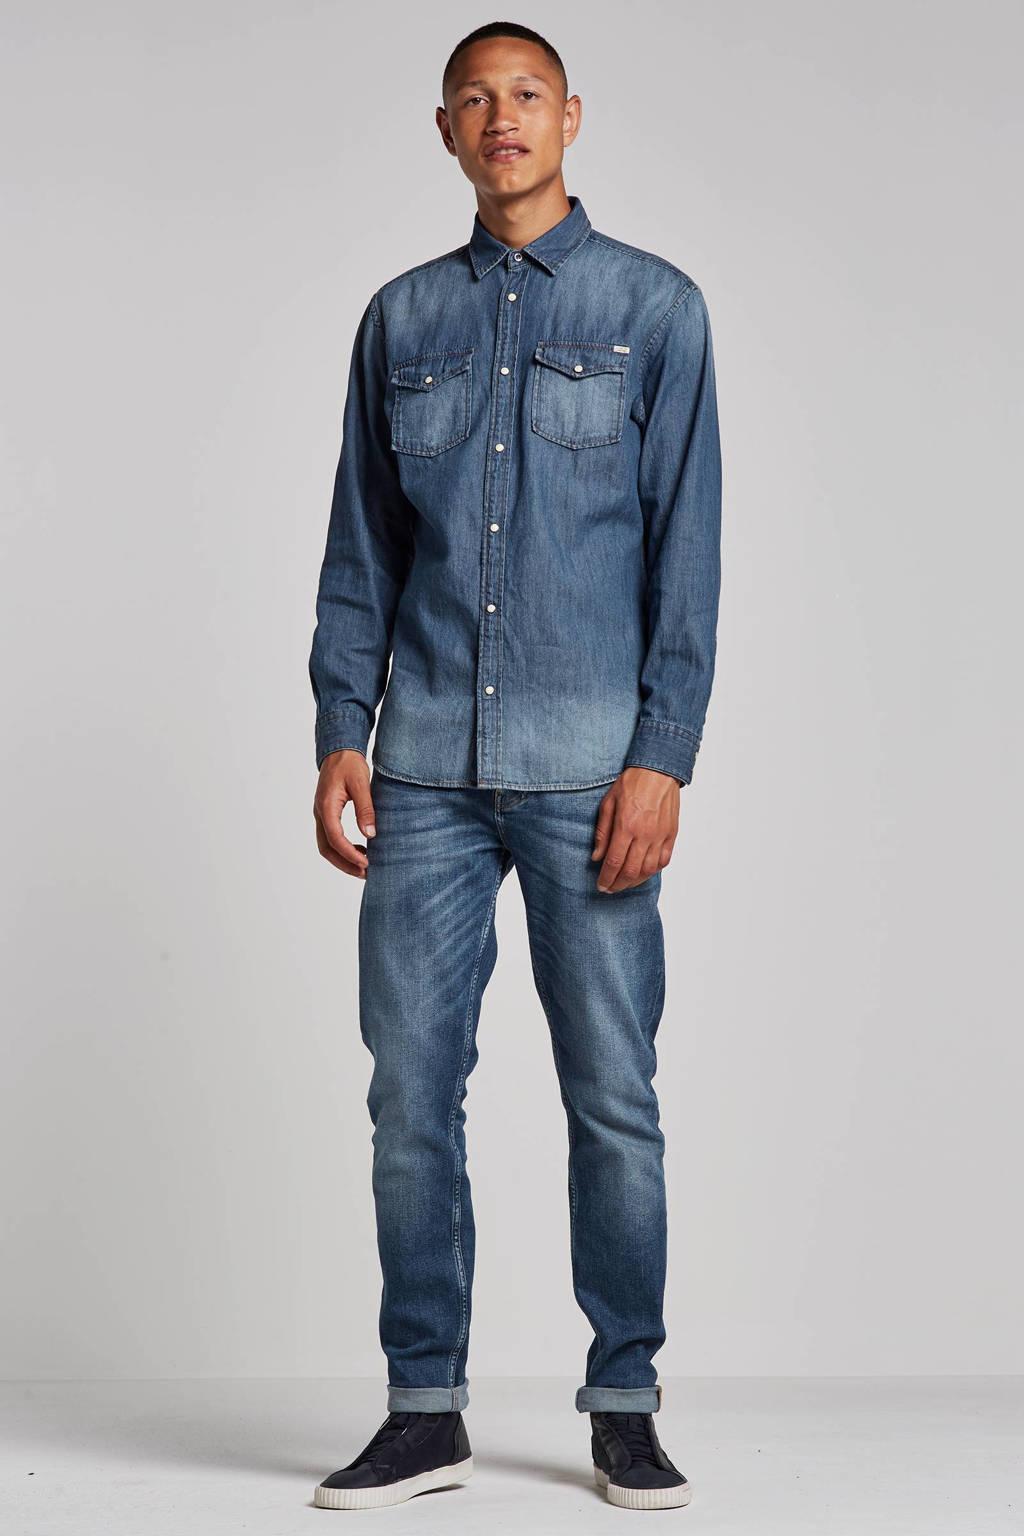 JACK & JONES ESSENTIALS Sheridan slim fit overhemd, Dark blue denim